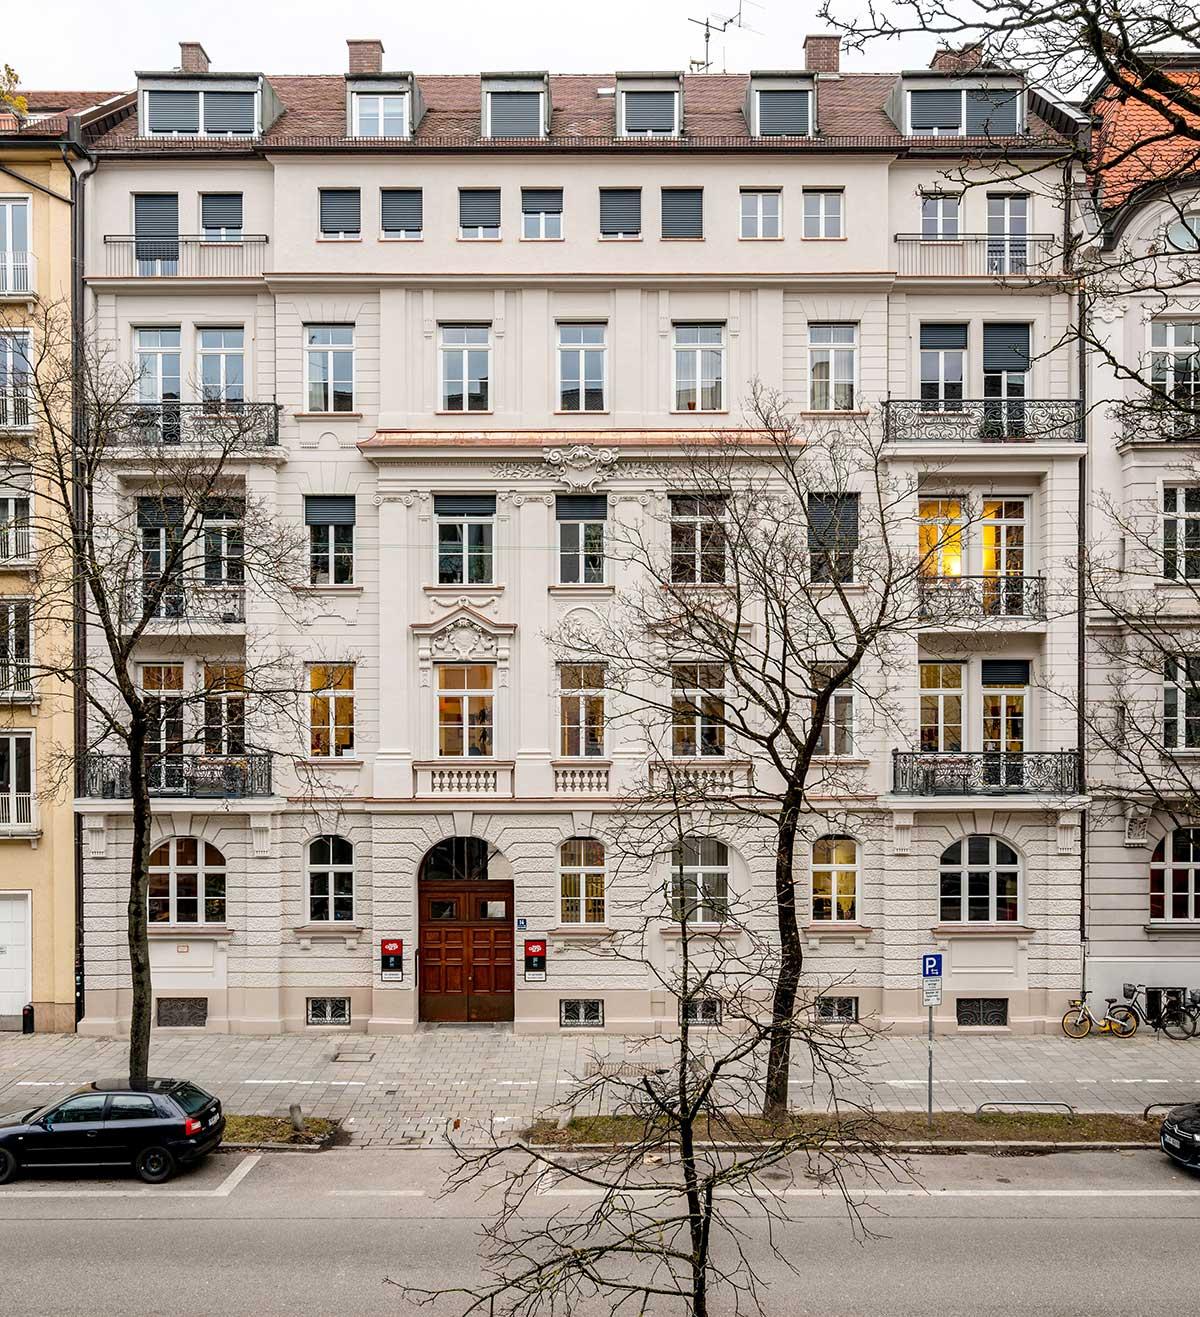 Franz-Joseph-Straße